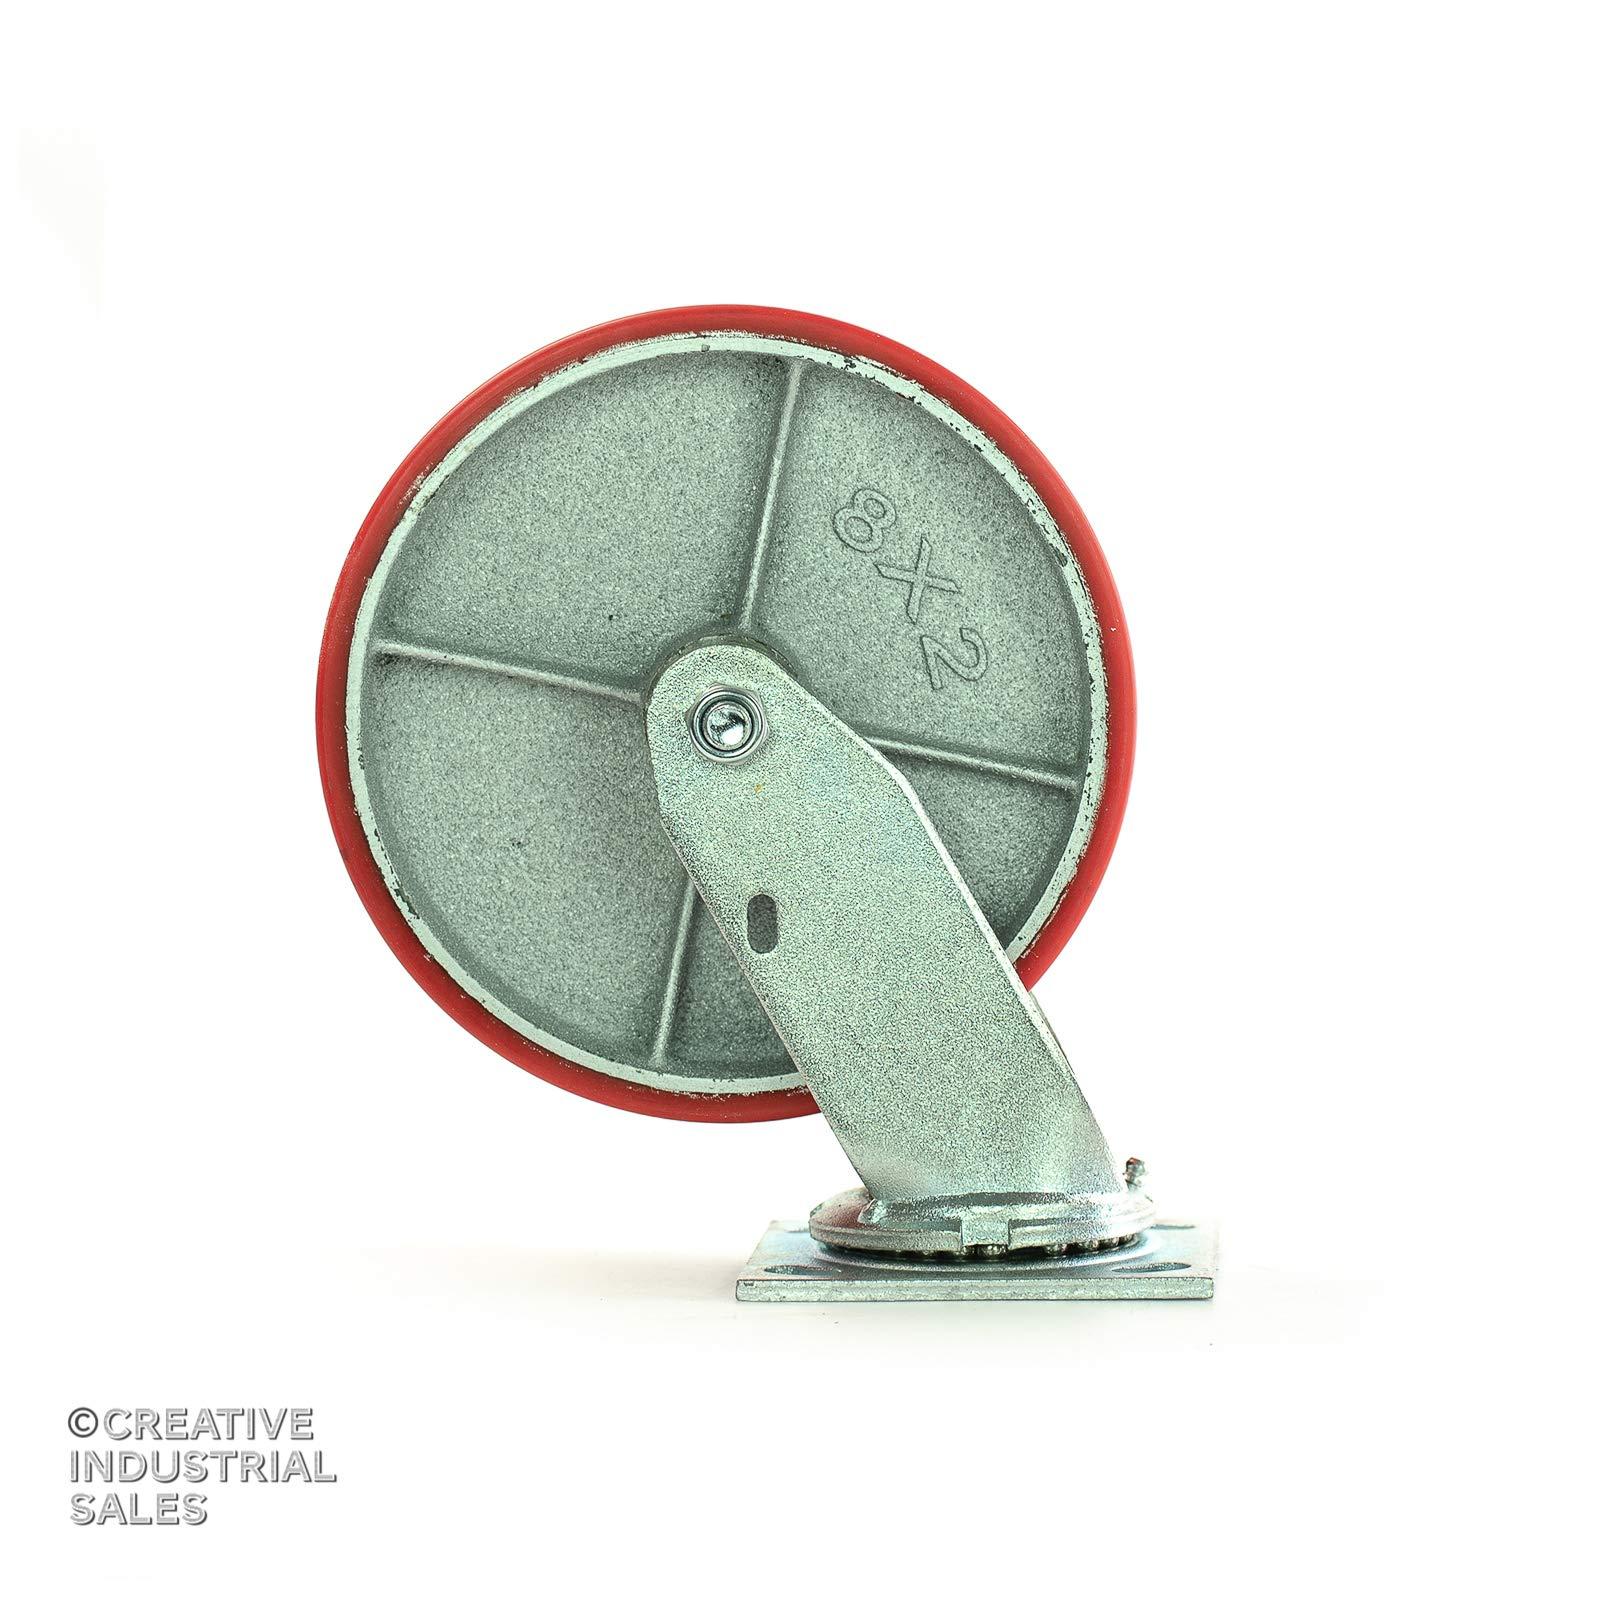 8'' X 2'' Swivel Casters Heavy Duty Polyurethane Wheel on Steel Hub (2) and Rigid (2) 1400lb Each by Creative Industrial Sales (Image #2)